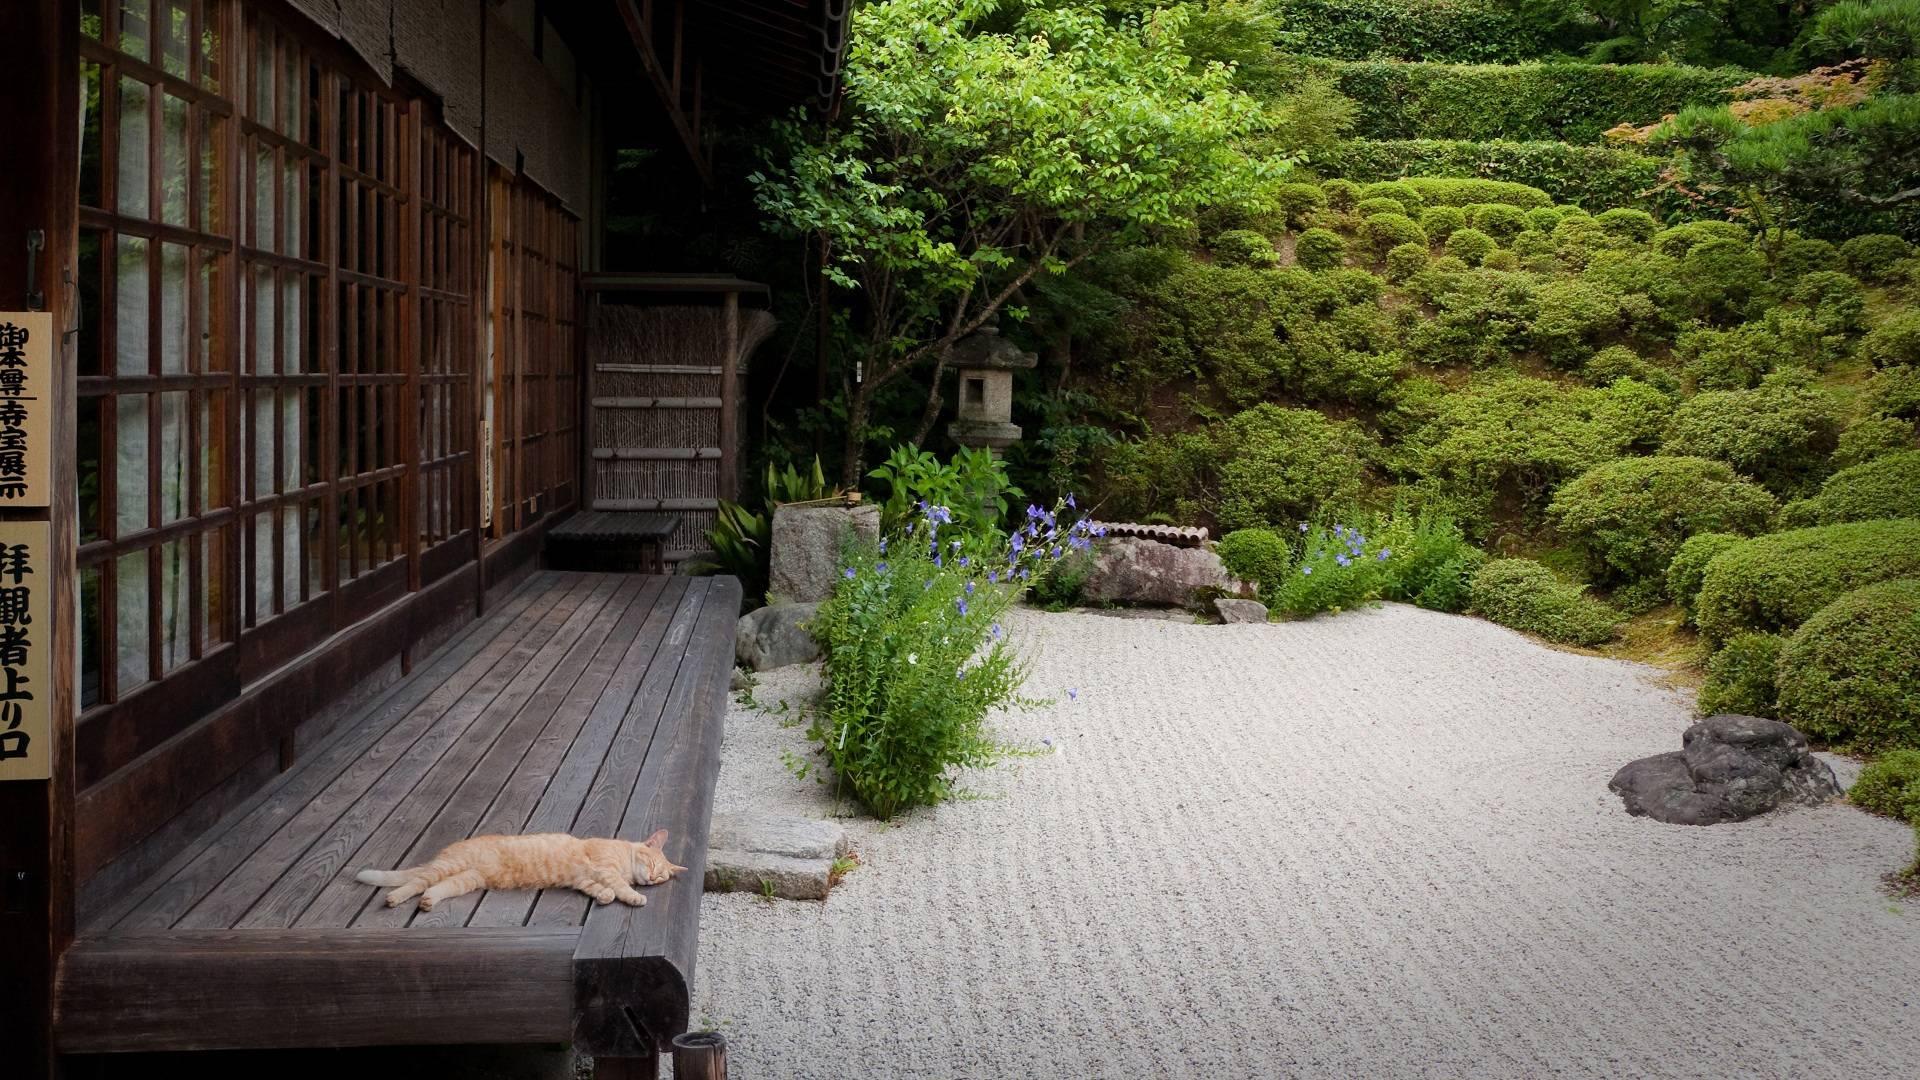 Japanese Garden Wallpapers - Wallpaper Cave